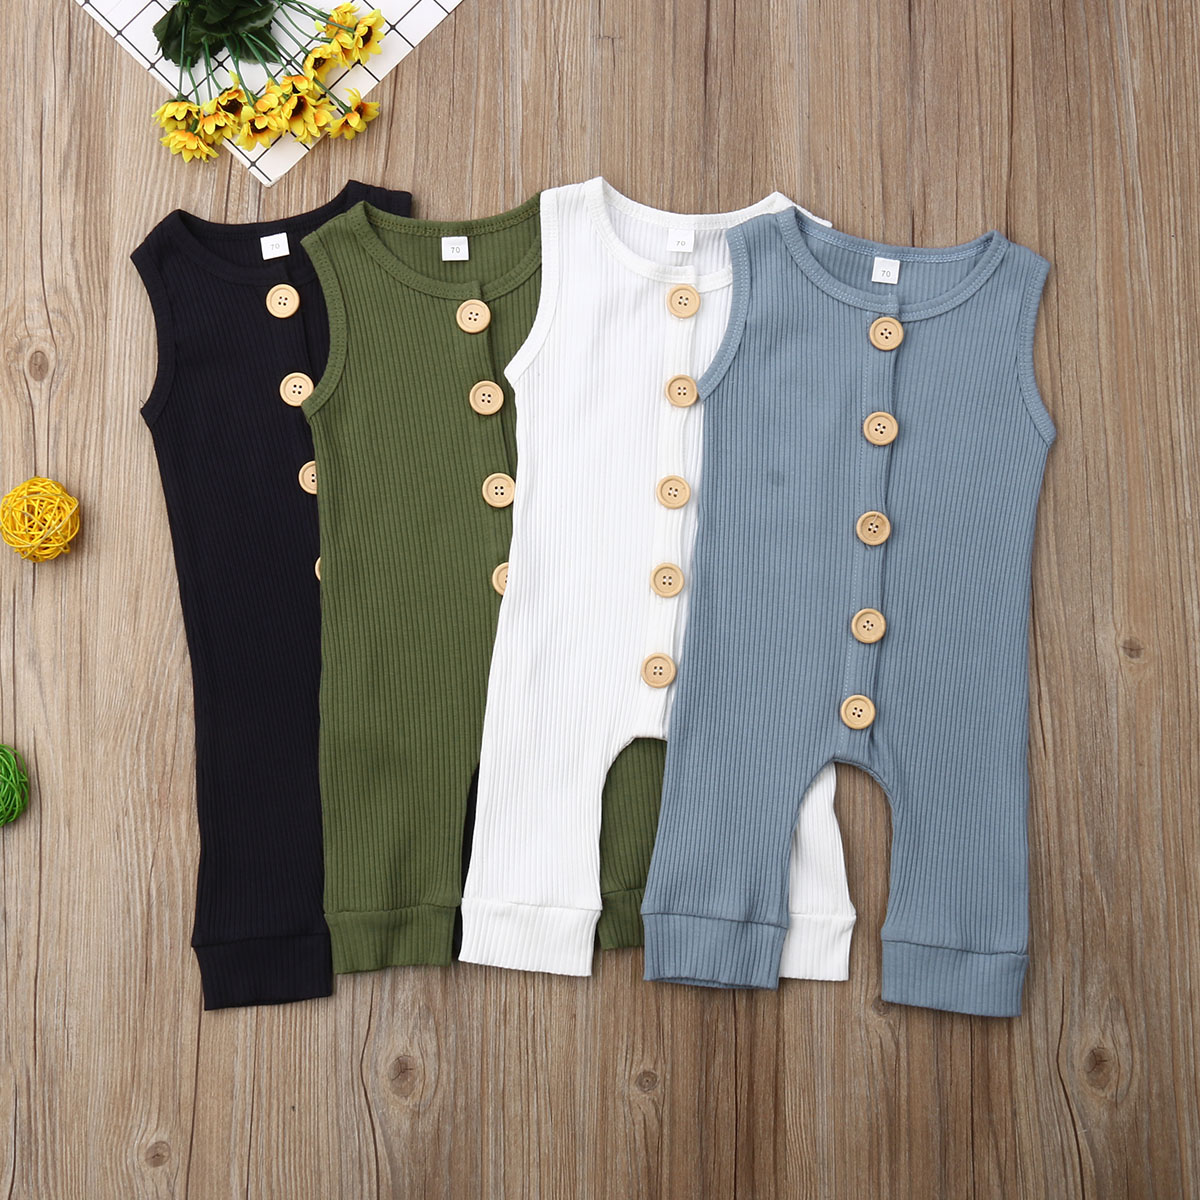 White Top Shirt Sailor Navy Blue Ruffle Baby Girl Pettiskirt Set 3-12m